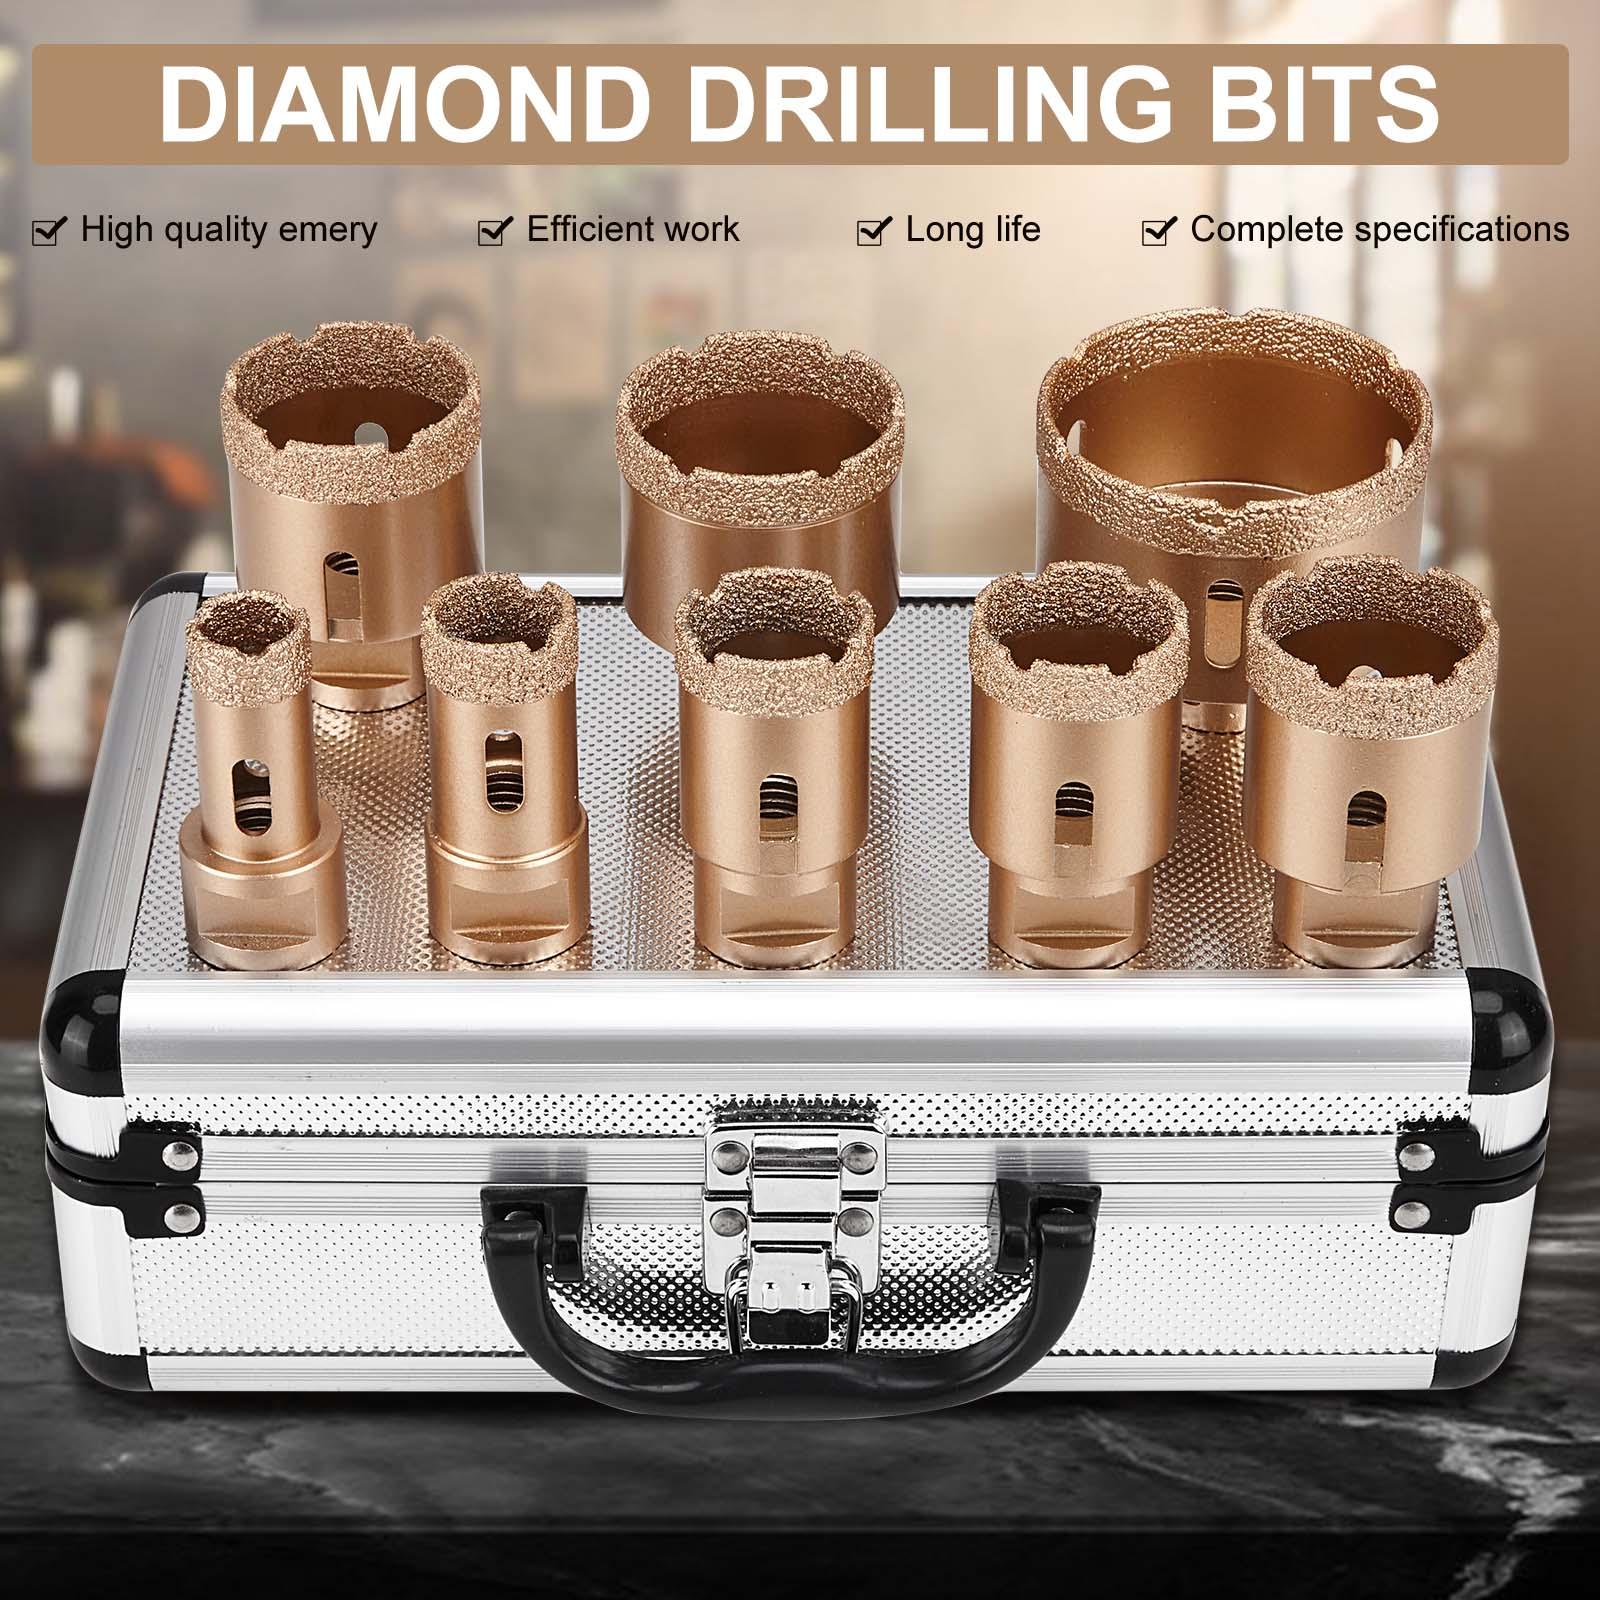 20-68mm Hole Saw Tile Drill Bits Diamond Drilling Core Bit Tiles Glass Granite Hole Saw Ceramic Porcelain Marble Drilling Bits